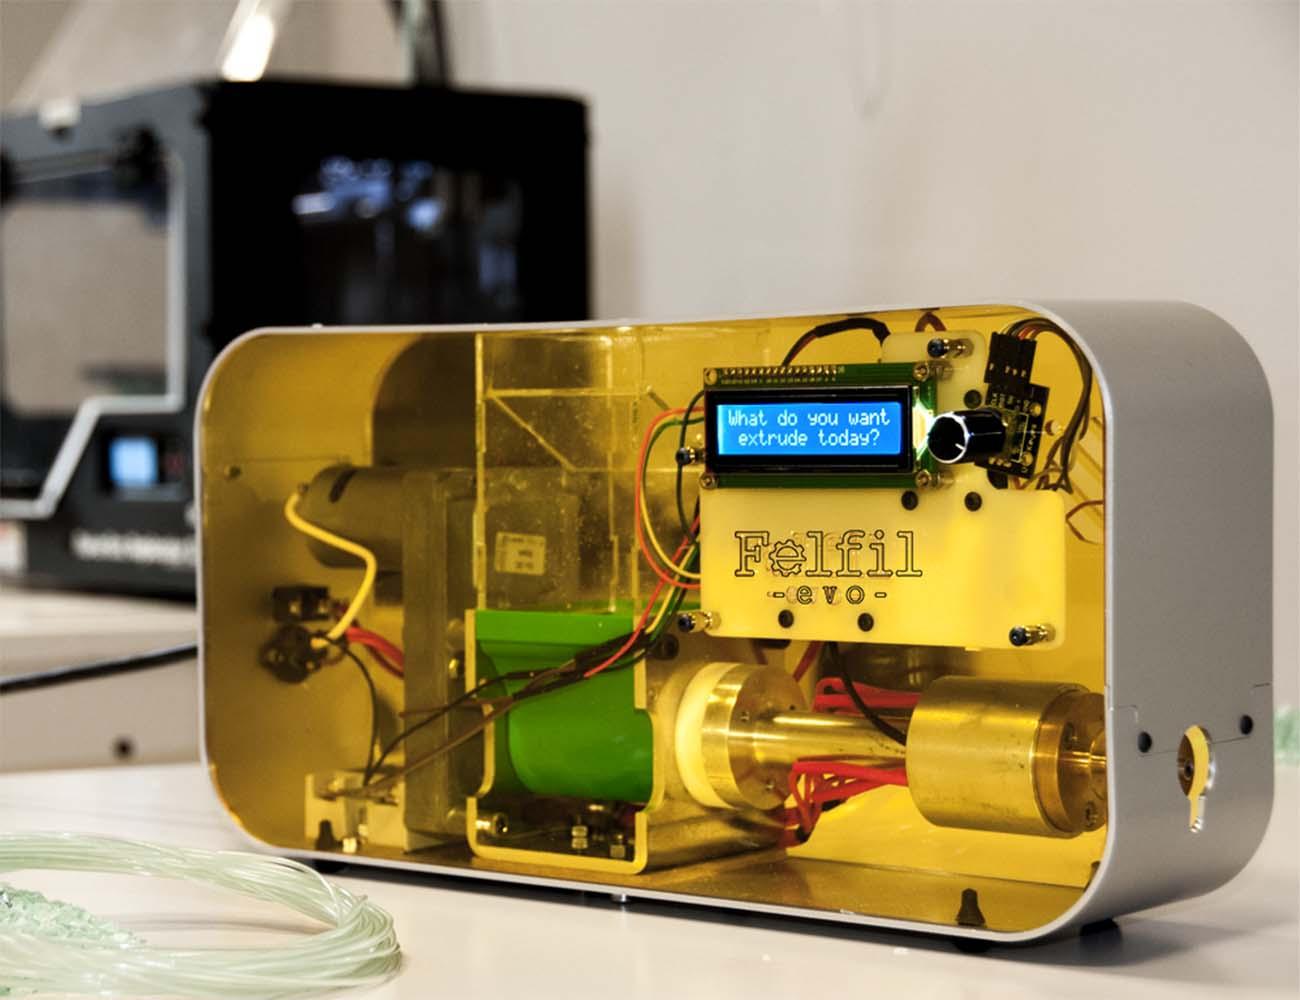 Felfil Evo The 3d Printer Filament Extruder 187 Gadget Flow